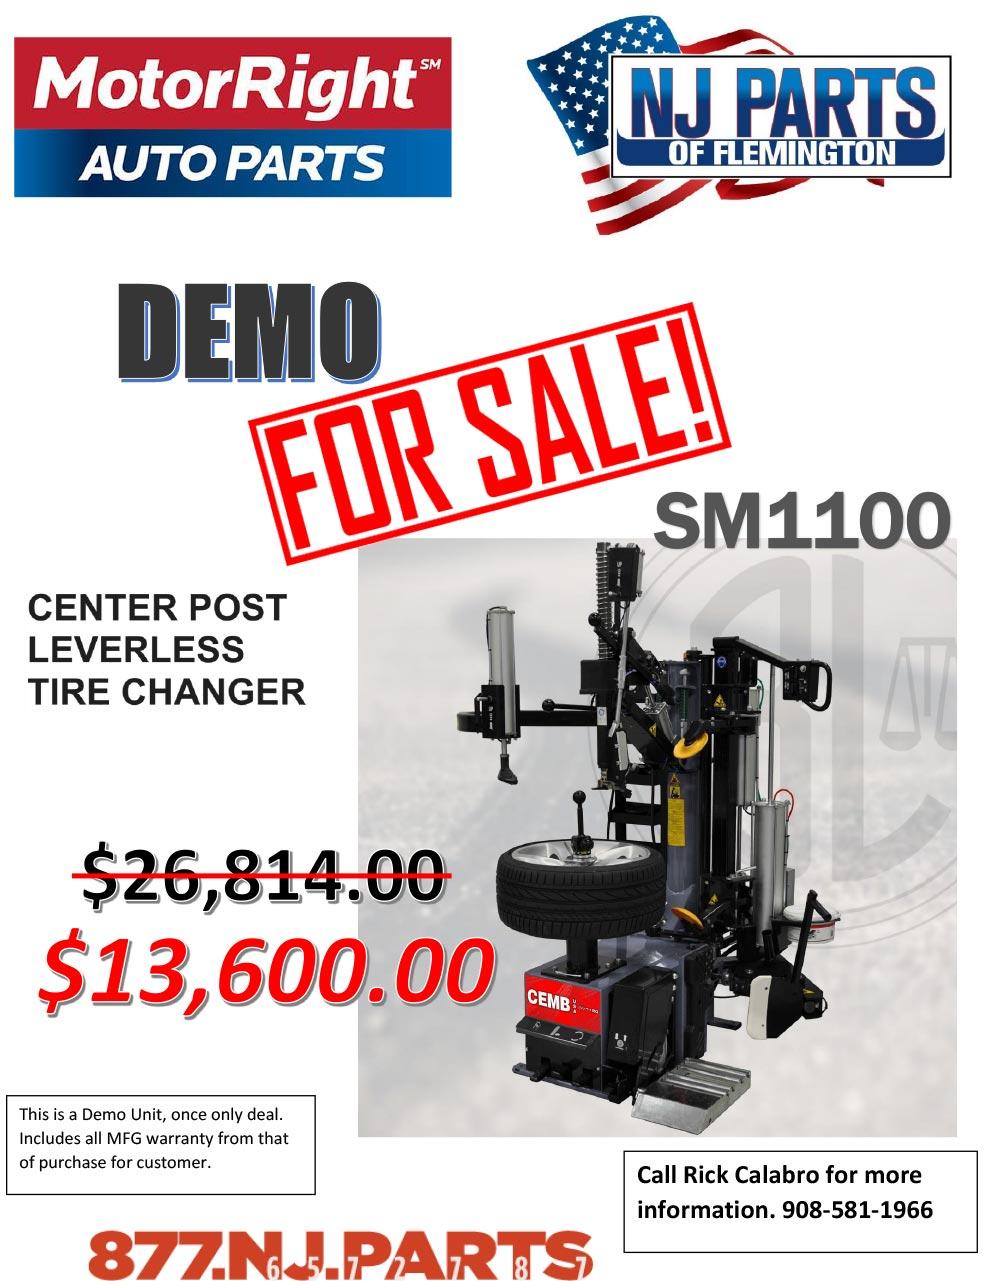 sm1100-demo-deal.jpg